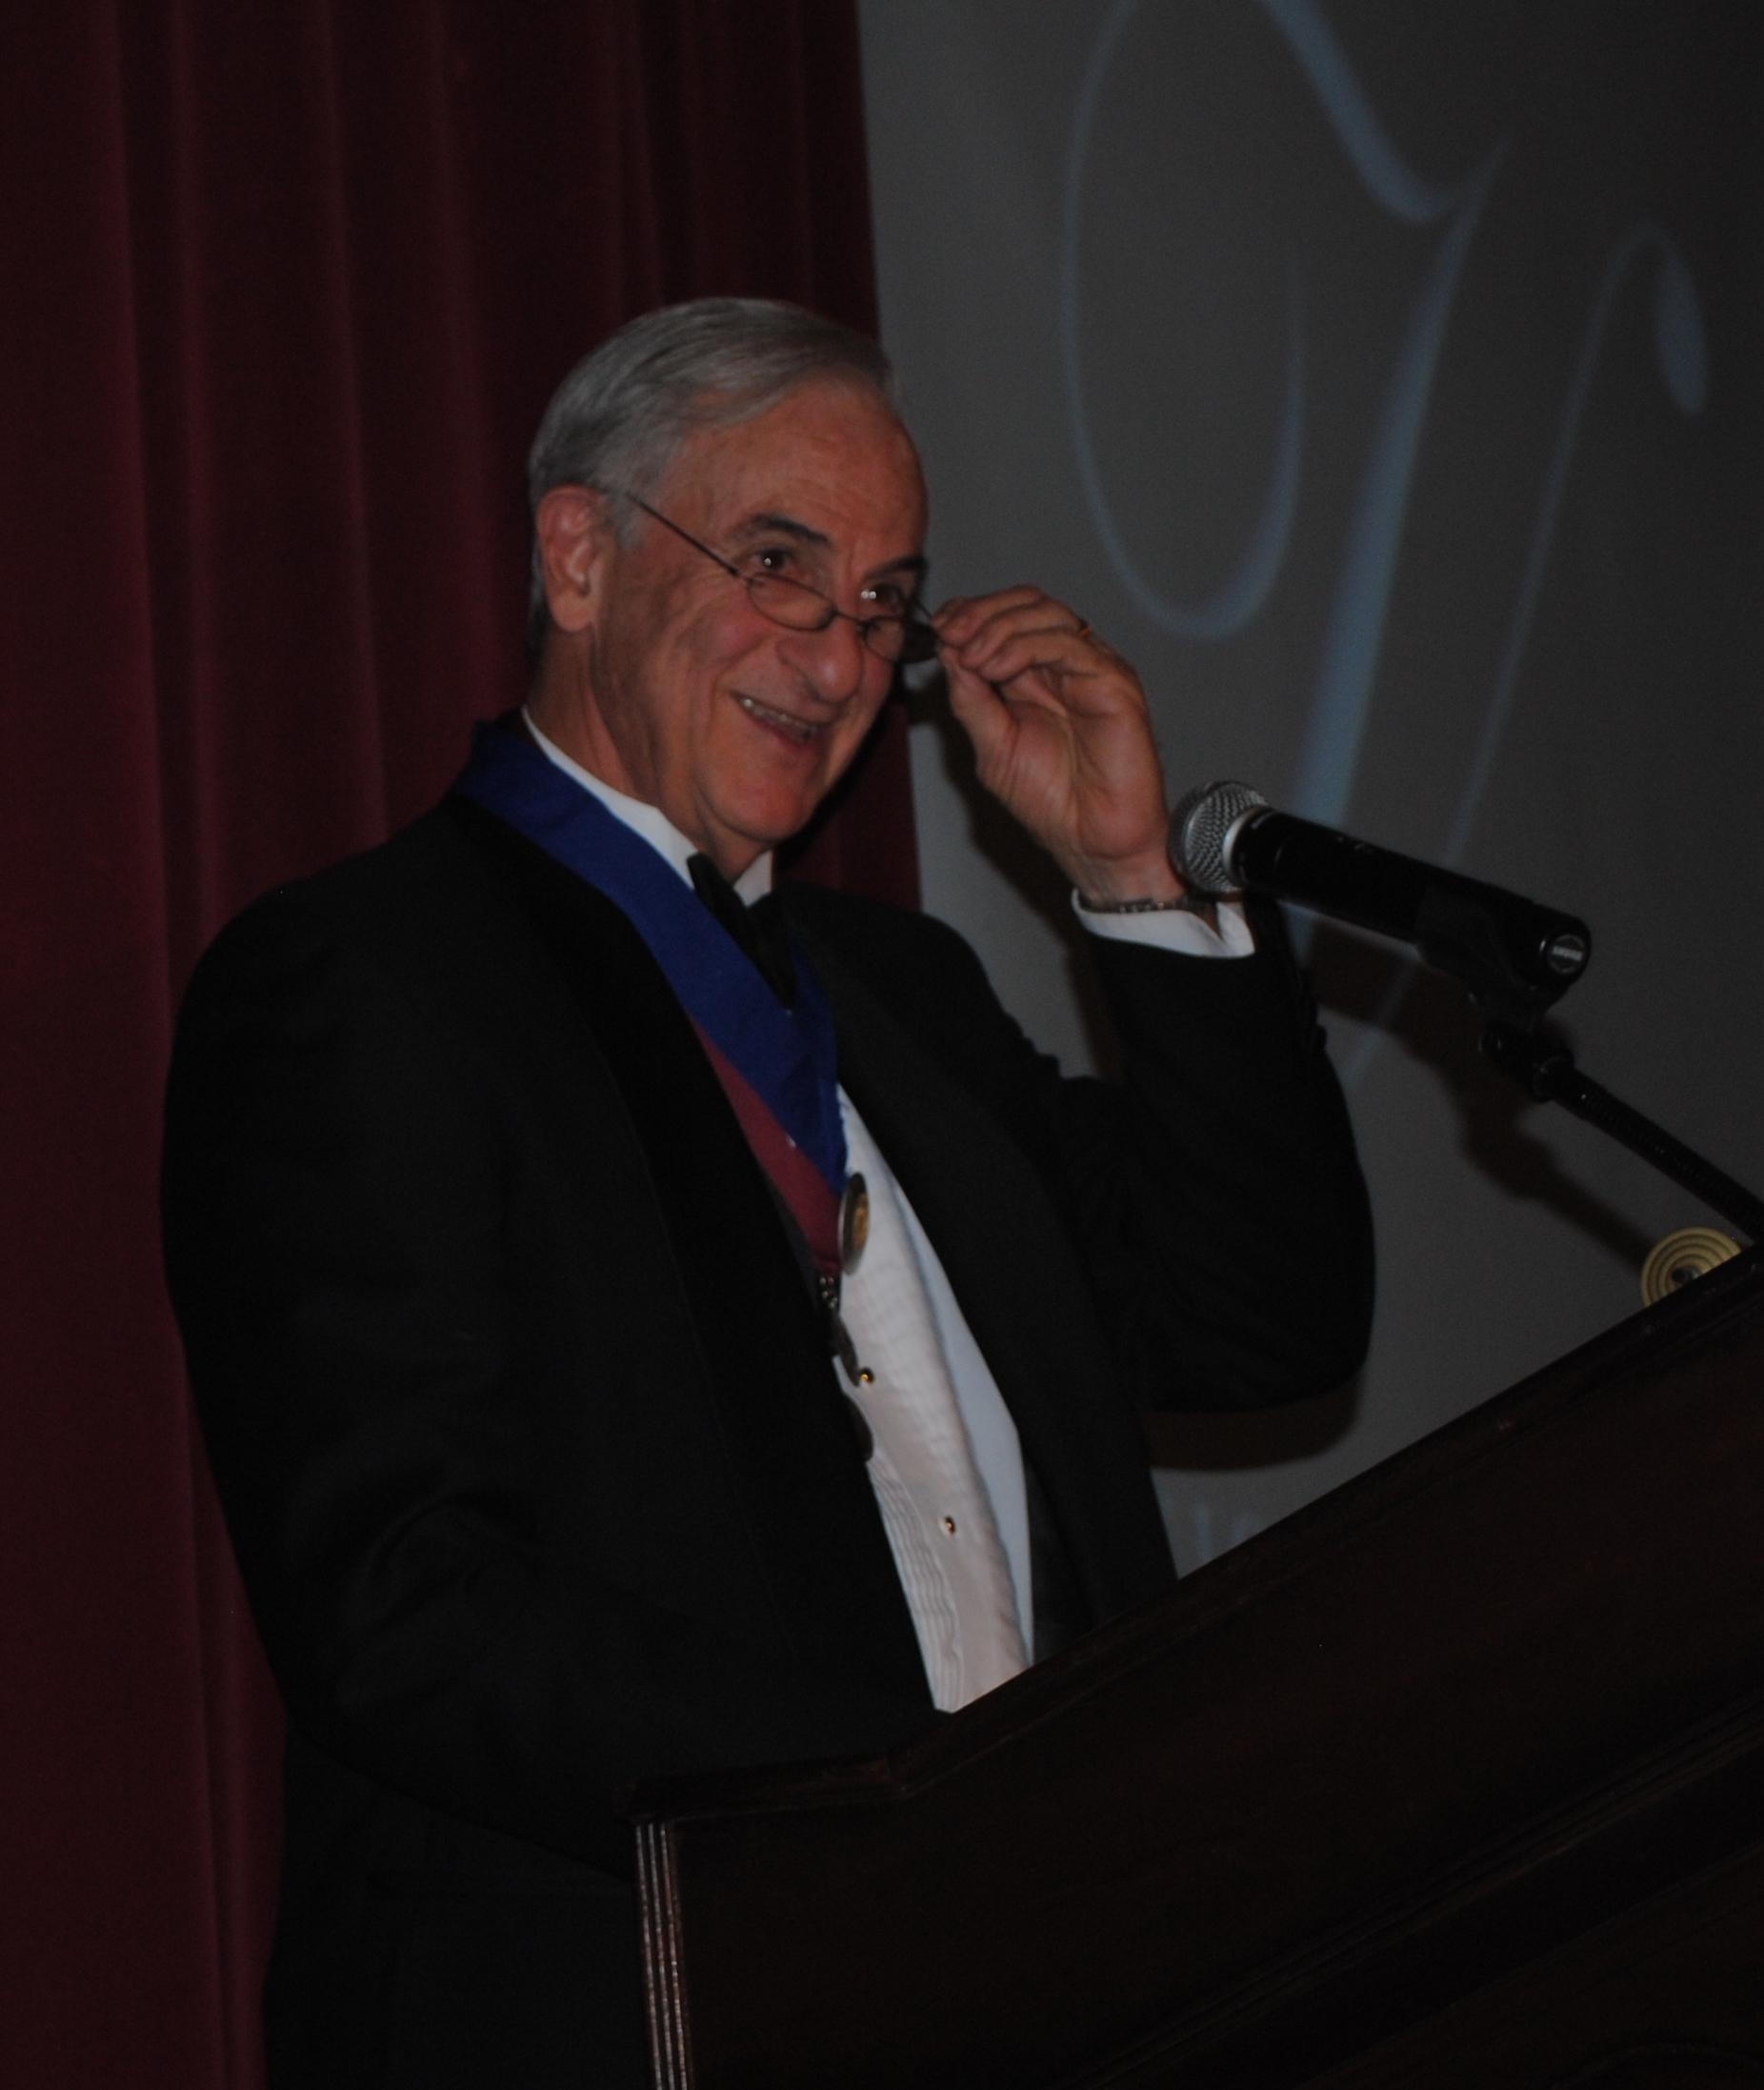 Honor and Design Awards Presented at Visions 2013